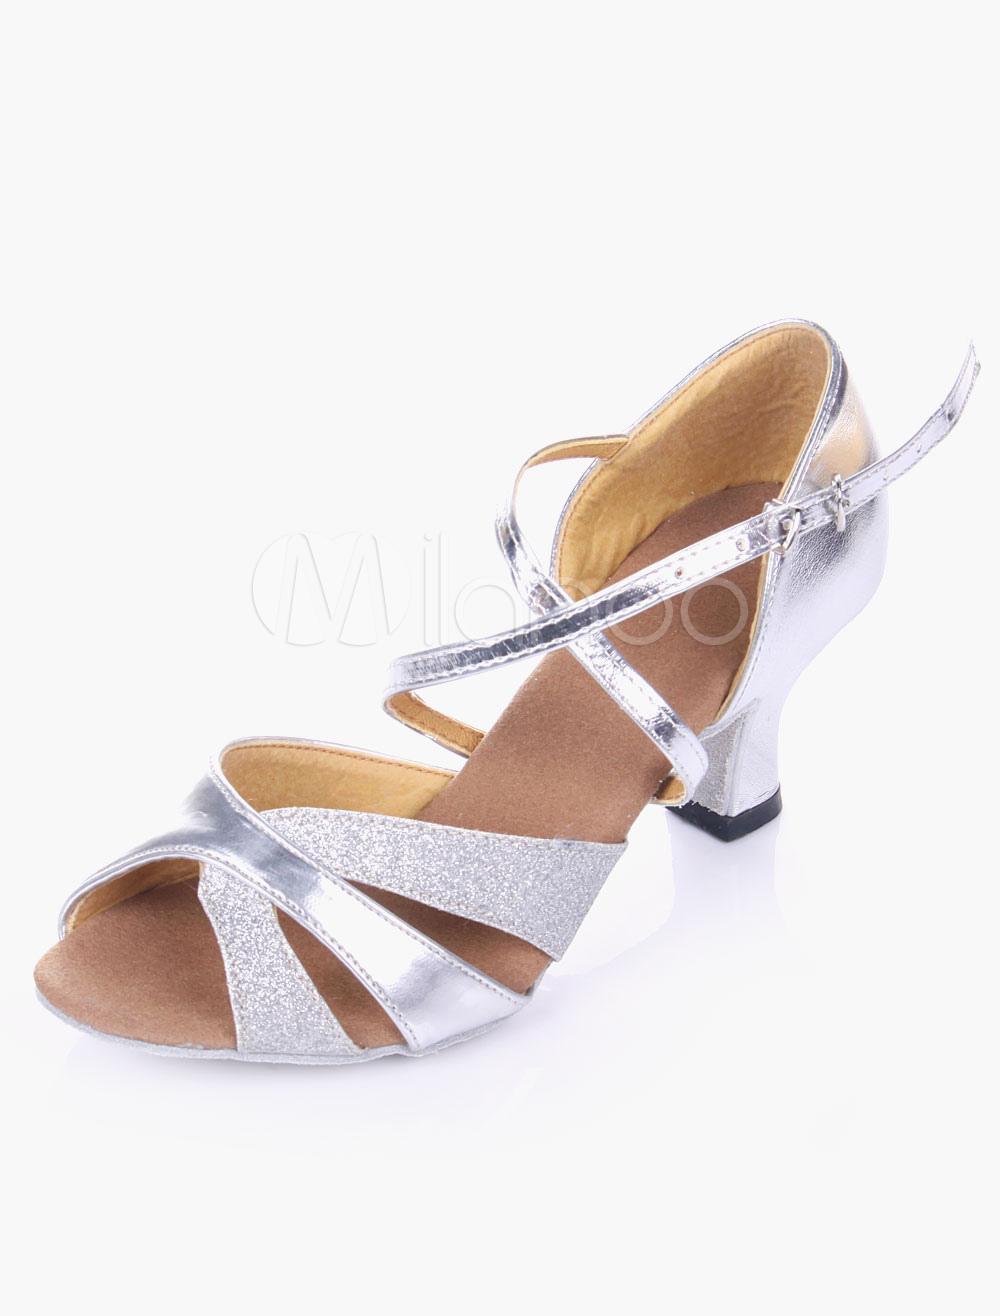 Silver Dance Shoes Glitter Ballroom Shoes Open Toe Criss Cross Latin Dancing Shoes